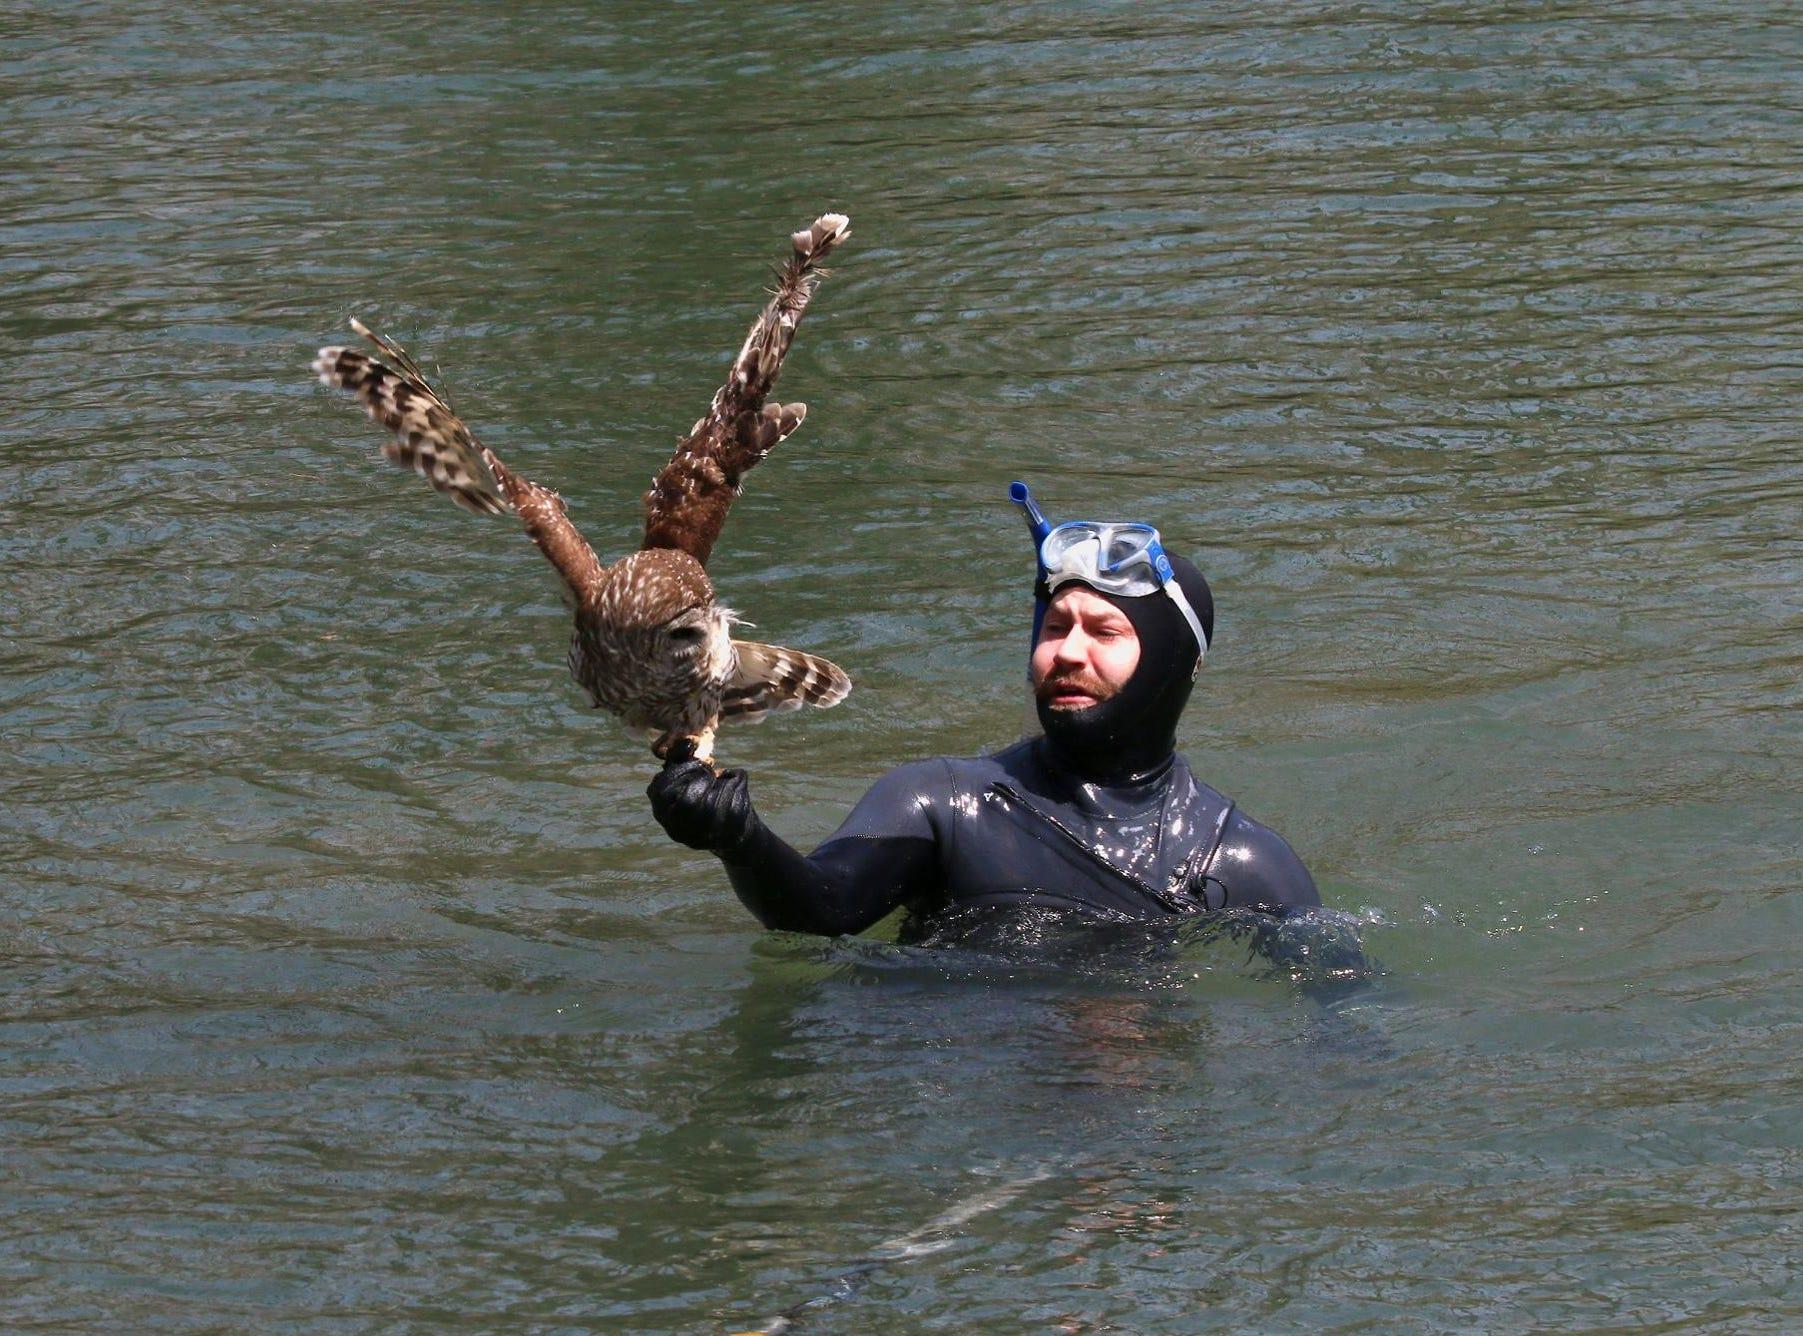 The injured owl fell right into Jonathan Knapp's hand.